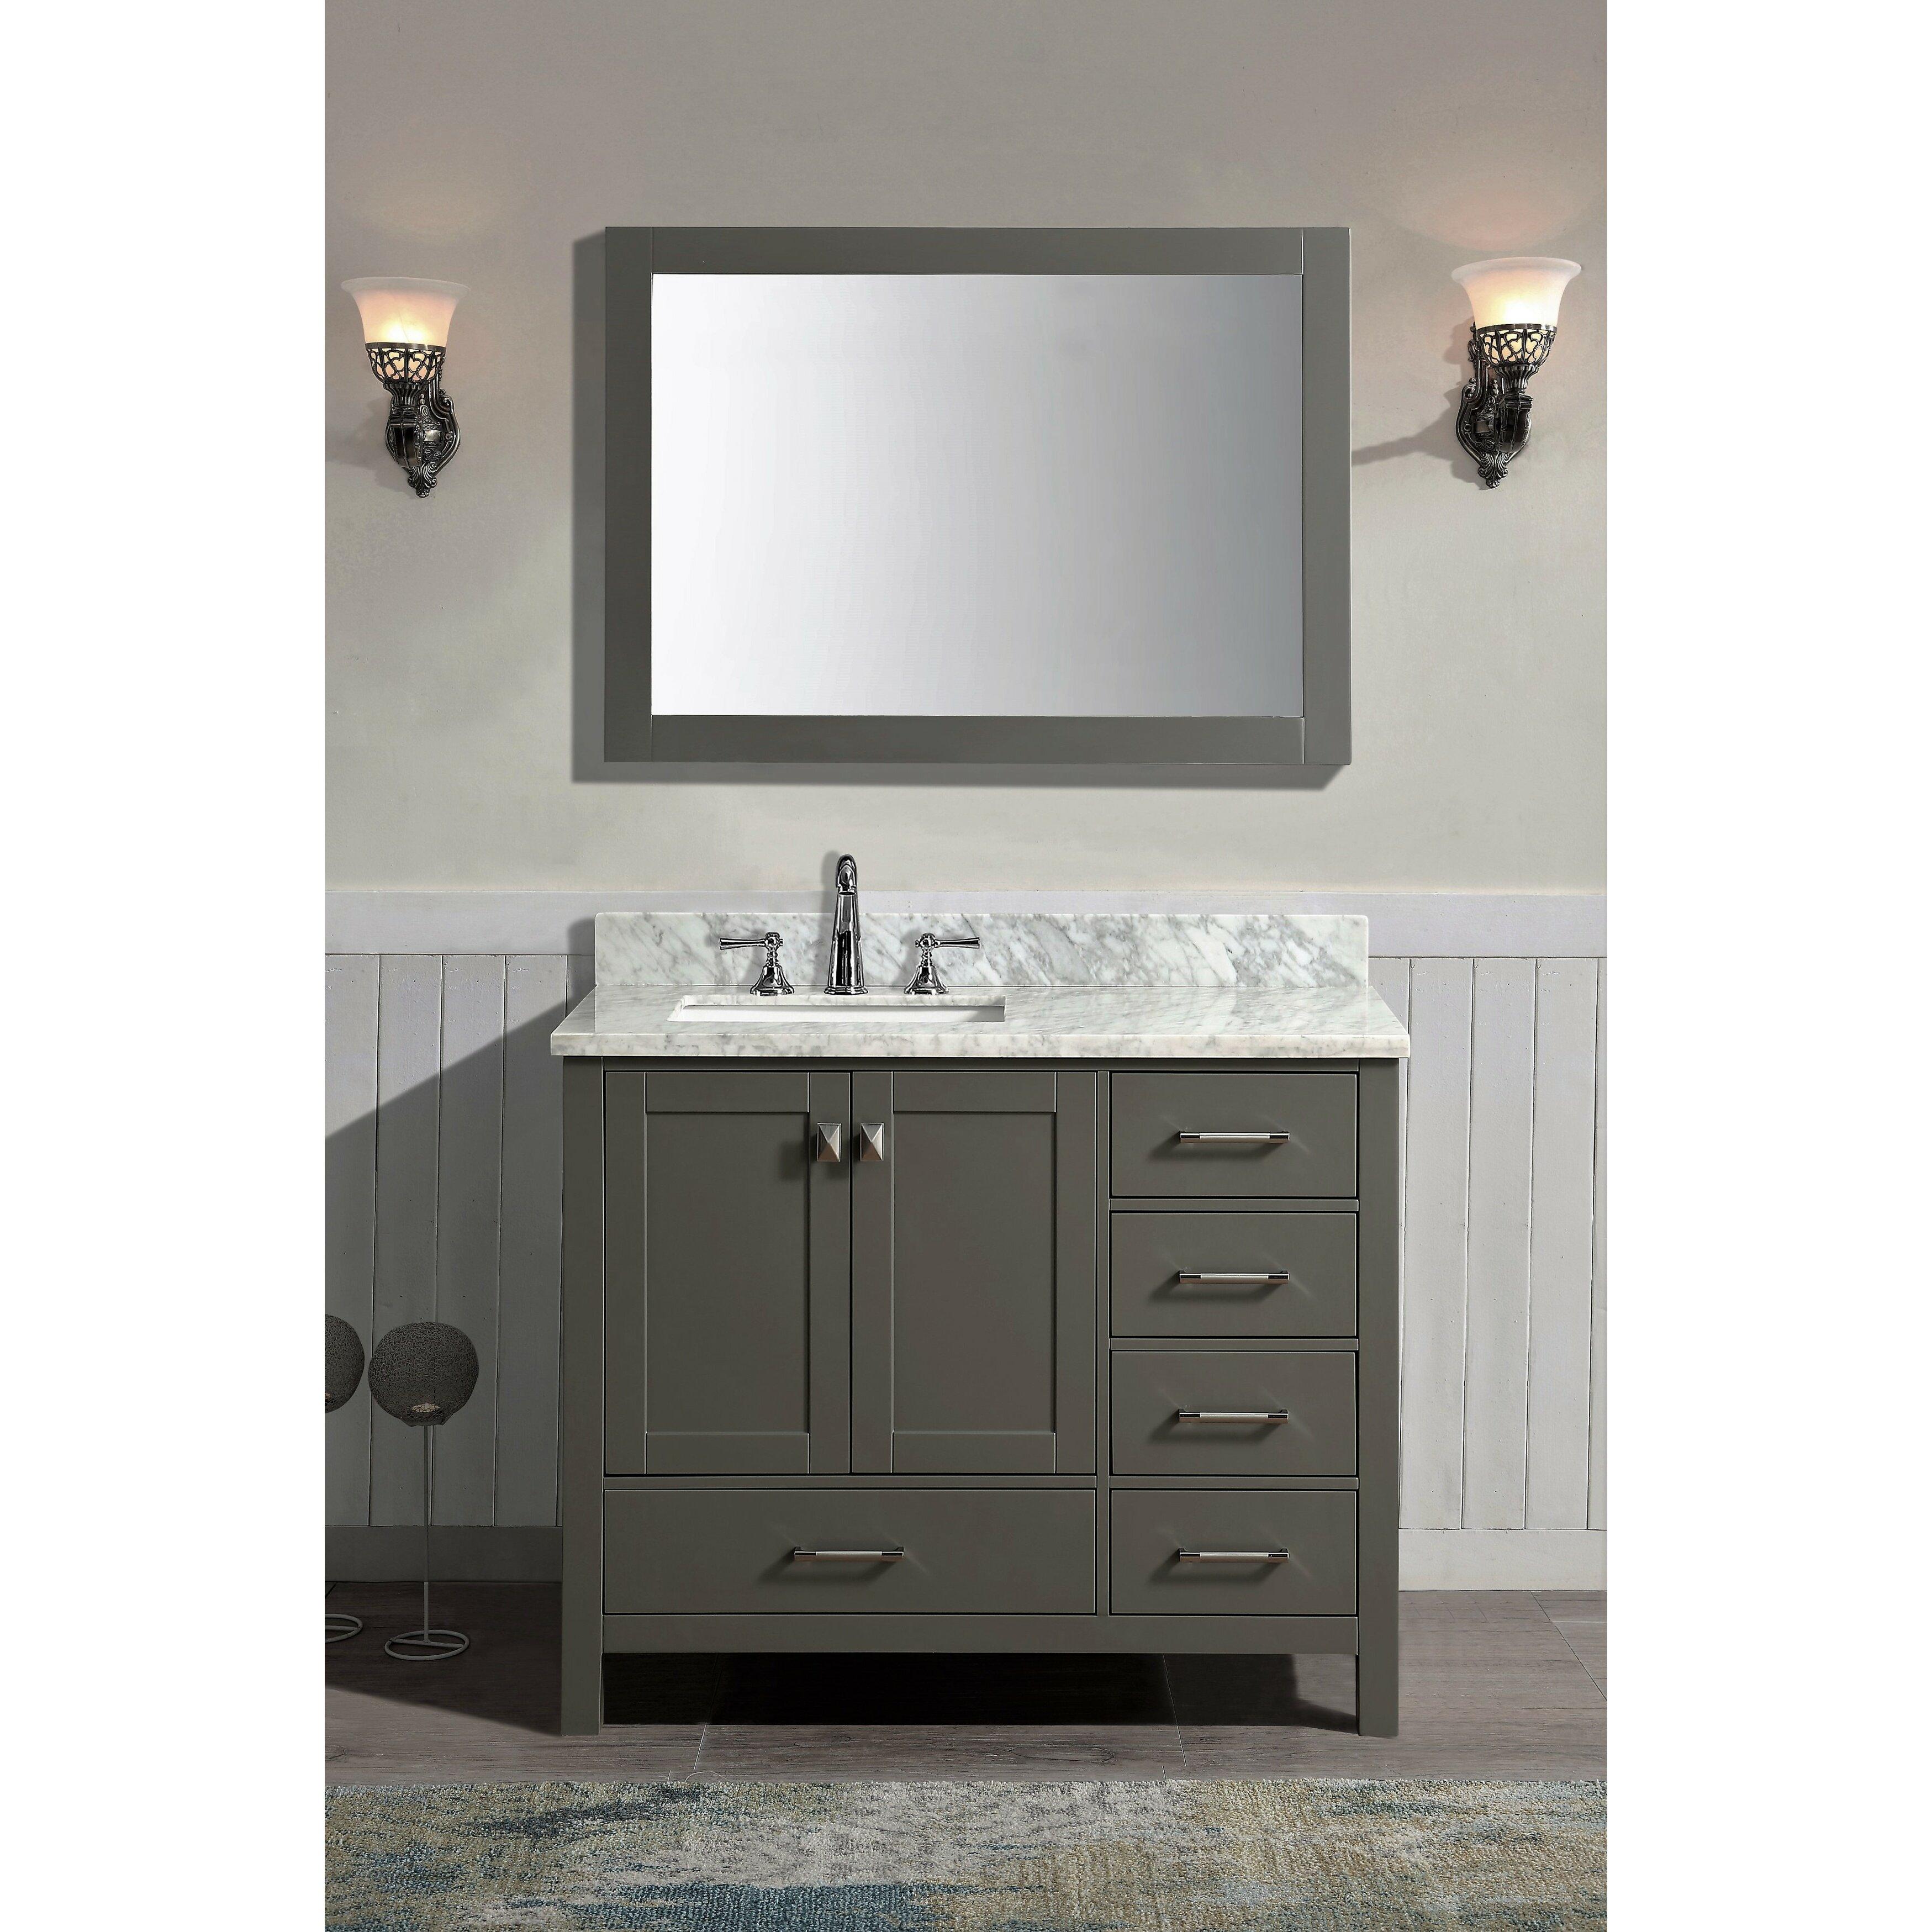 Ari Kitchen amp amp Bath Bella 42 amp quot Single Bathroom Vanity  Ari  Kitchen amp. Bathroom Countertop Decor